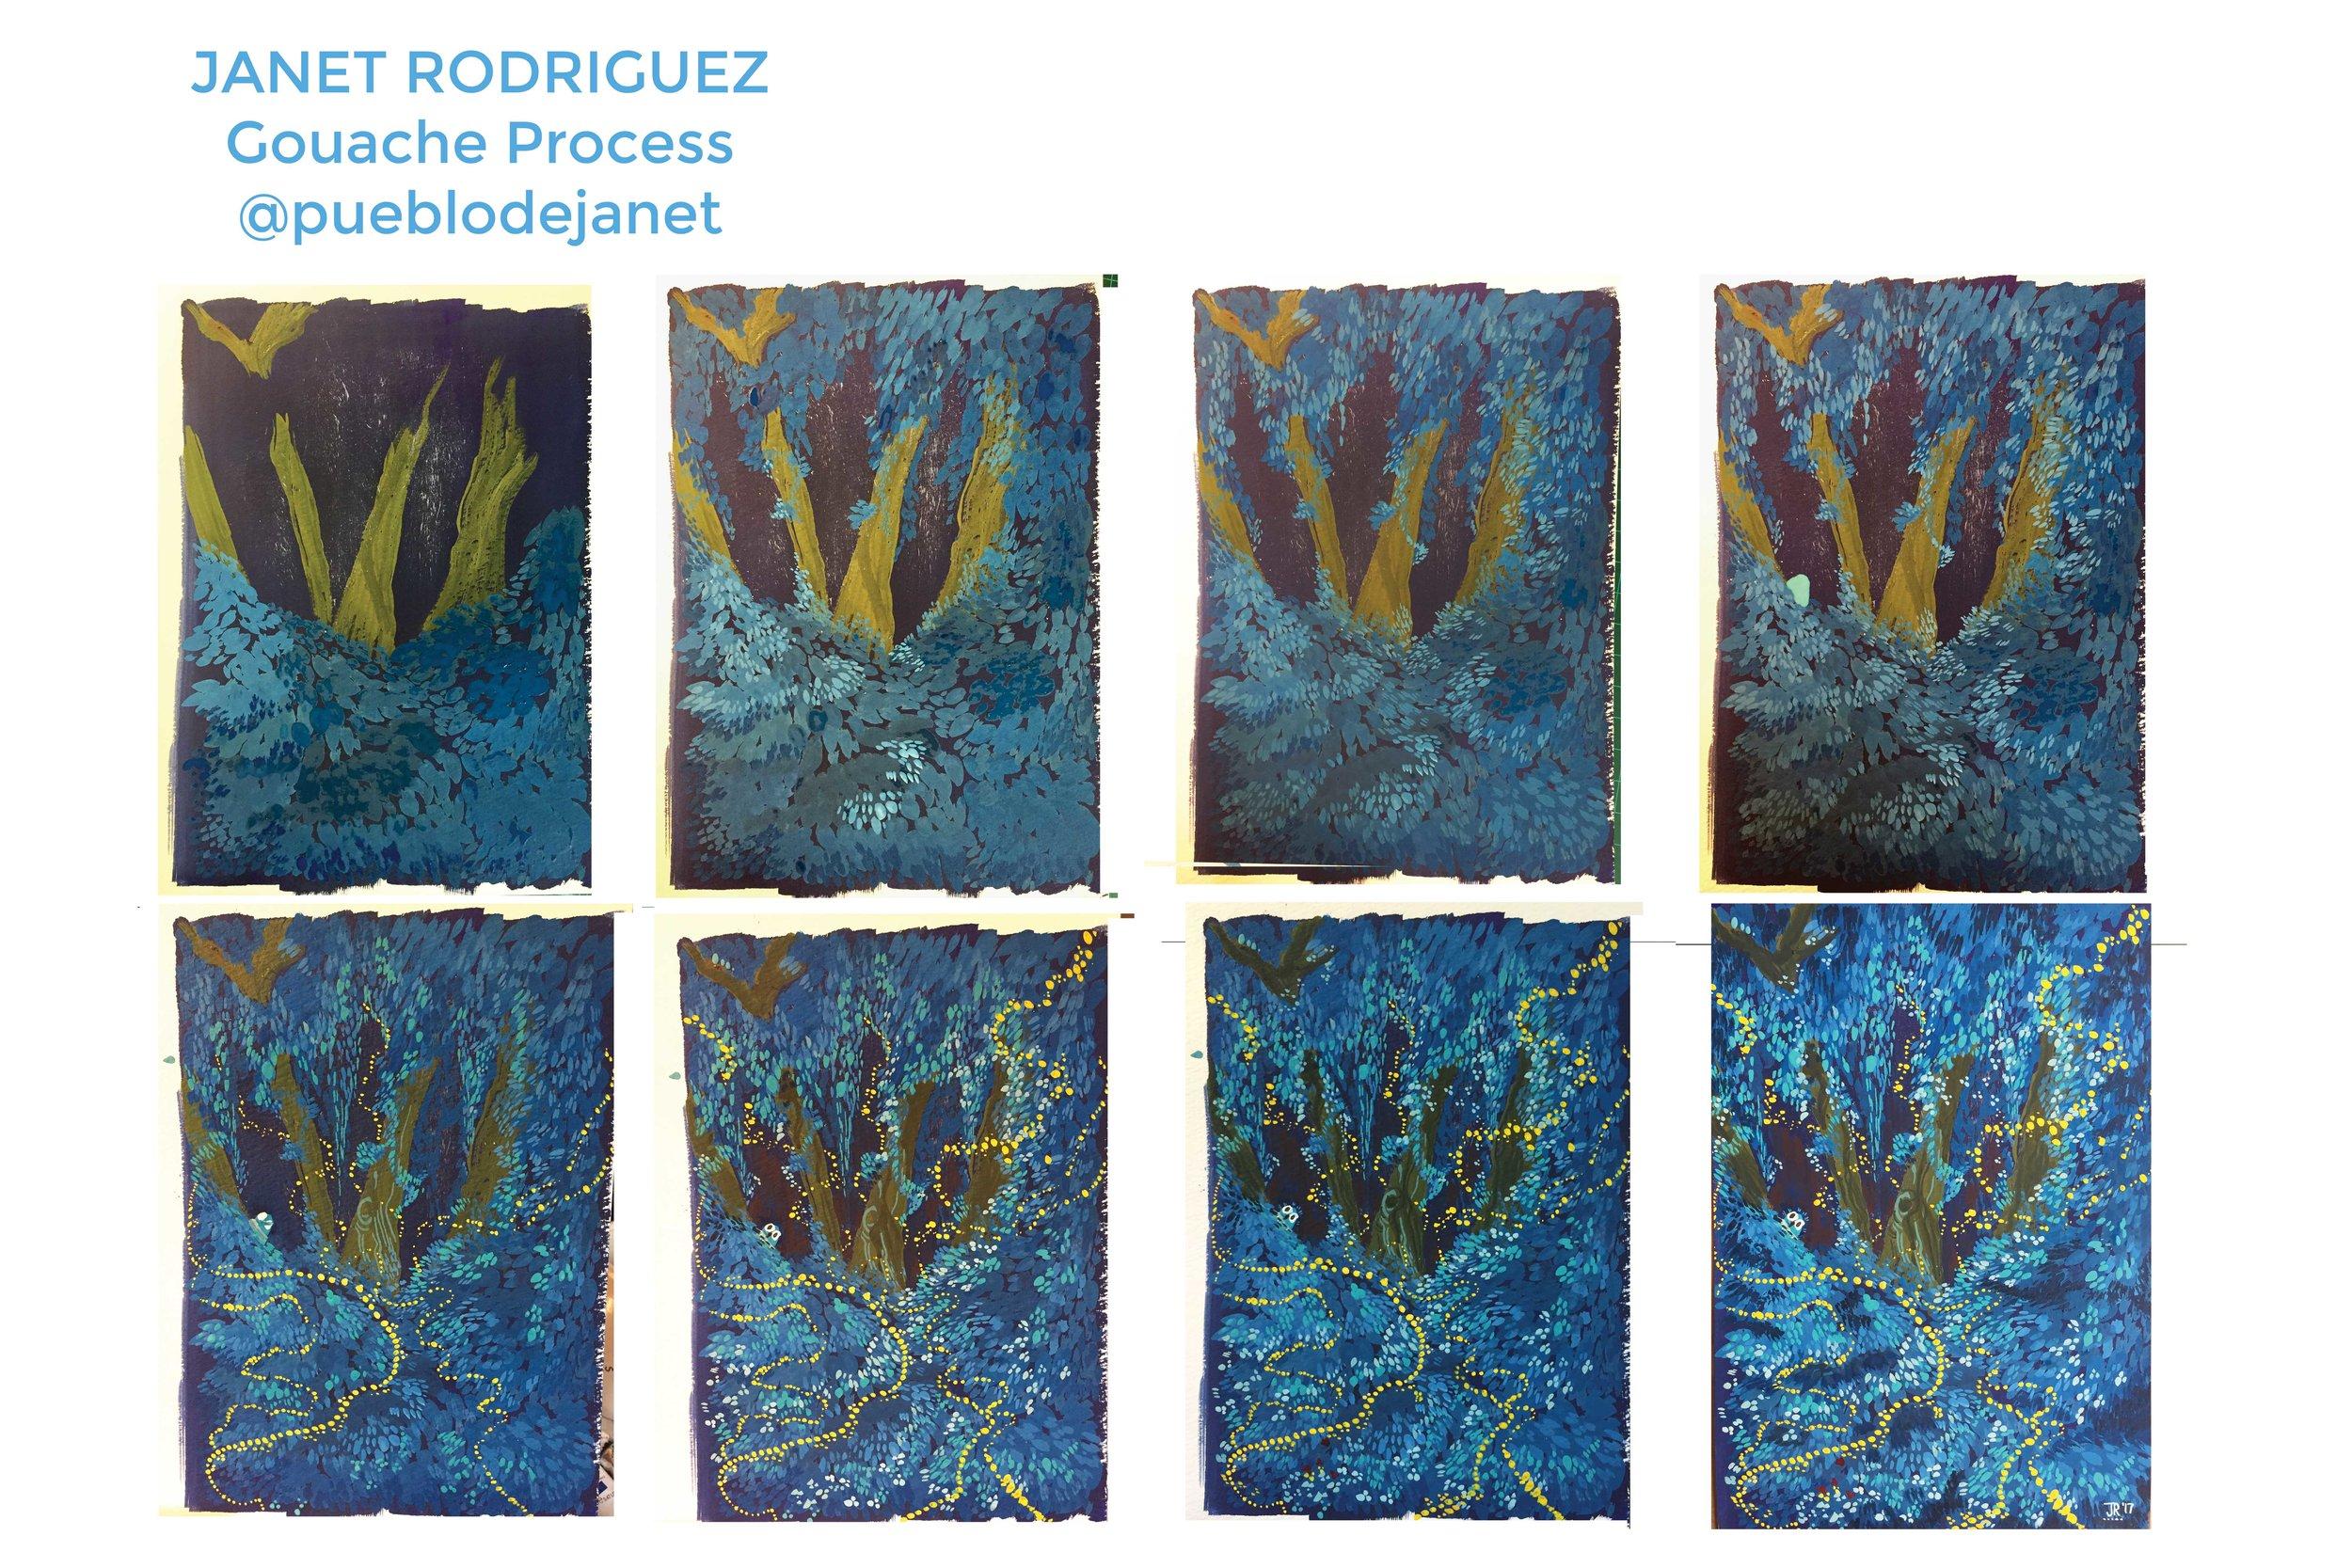 Goauche Process, 2017